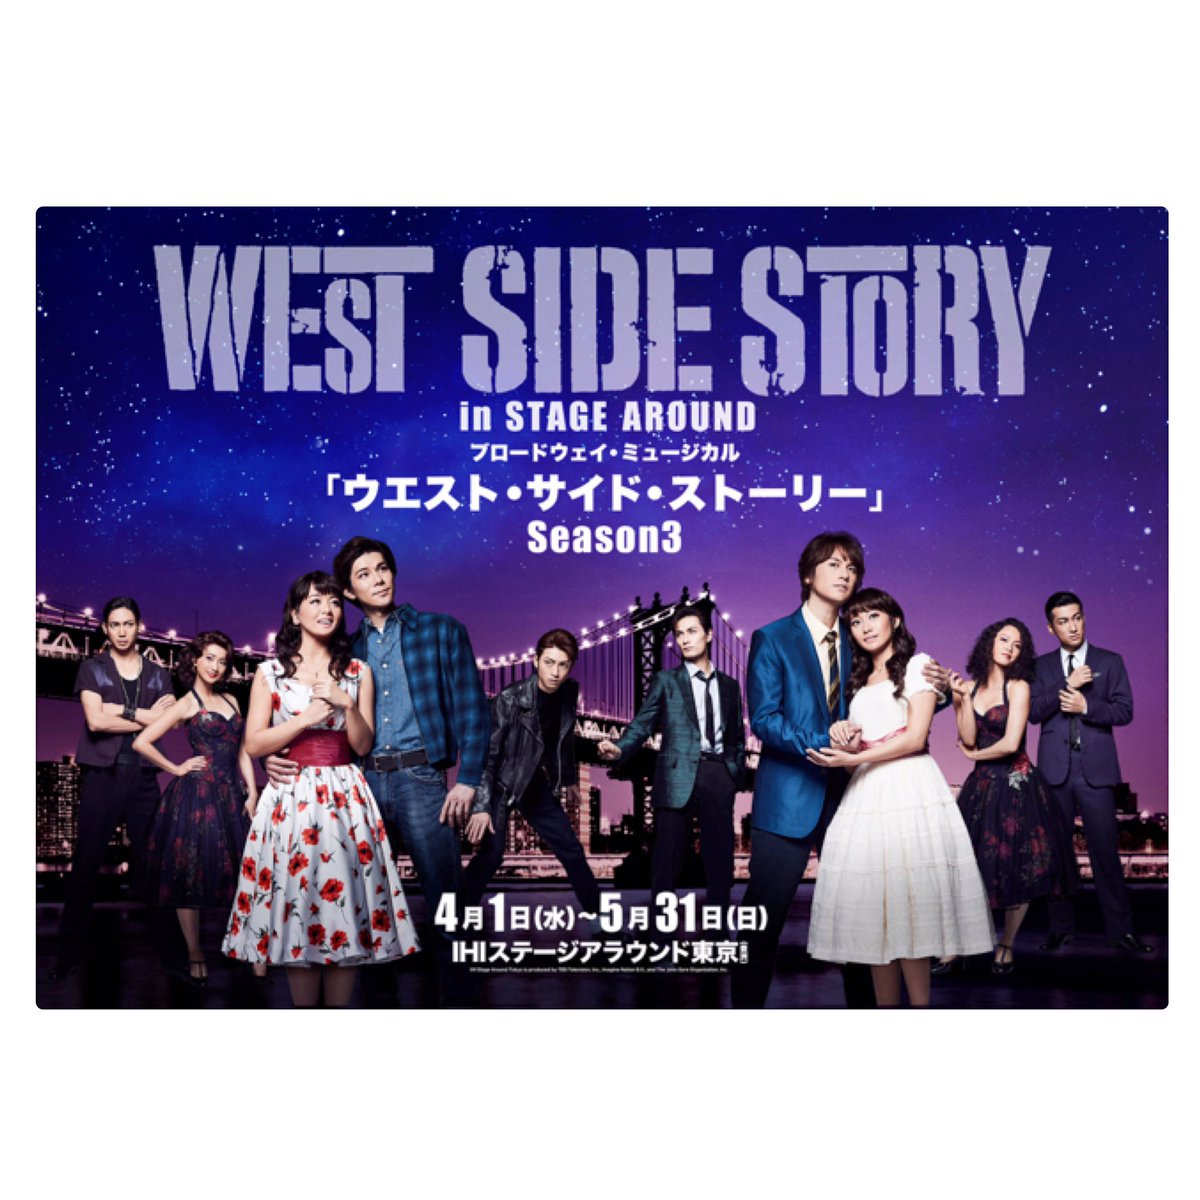 test ツイッターメディア - WEST SIDE STORY season3 メインビジュアル解禁されました︎︎☺︎  ひぇ〜〜〜〜。頑張ります。   #WSS https://t.co/Dr2ud5Ownx